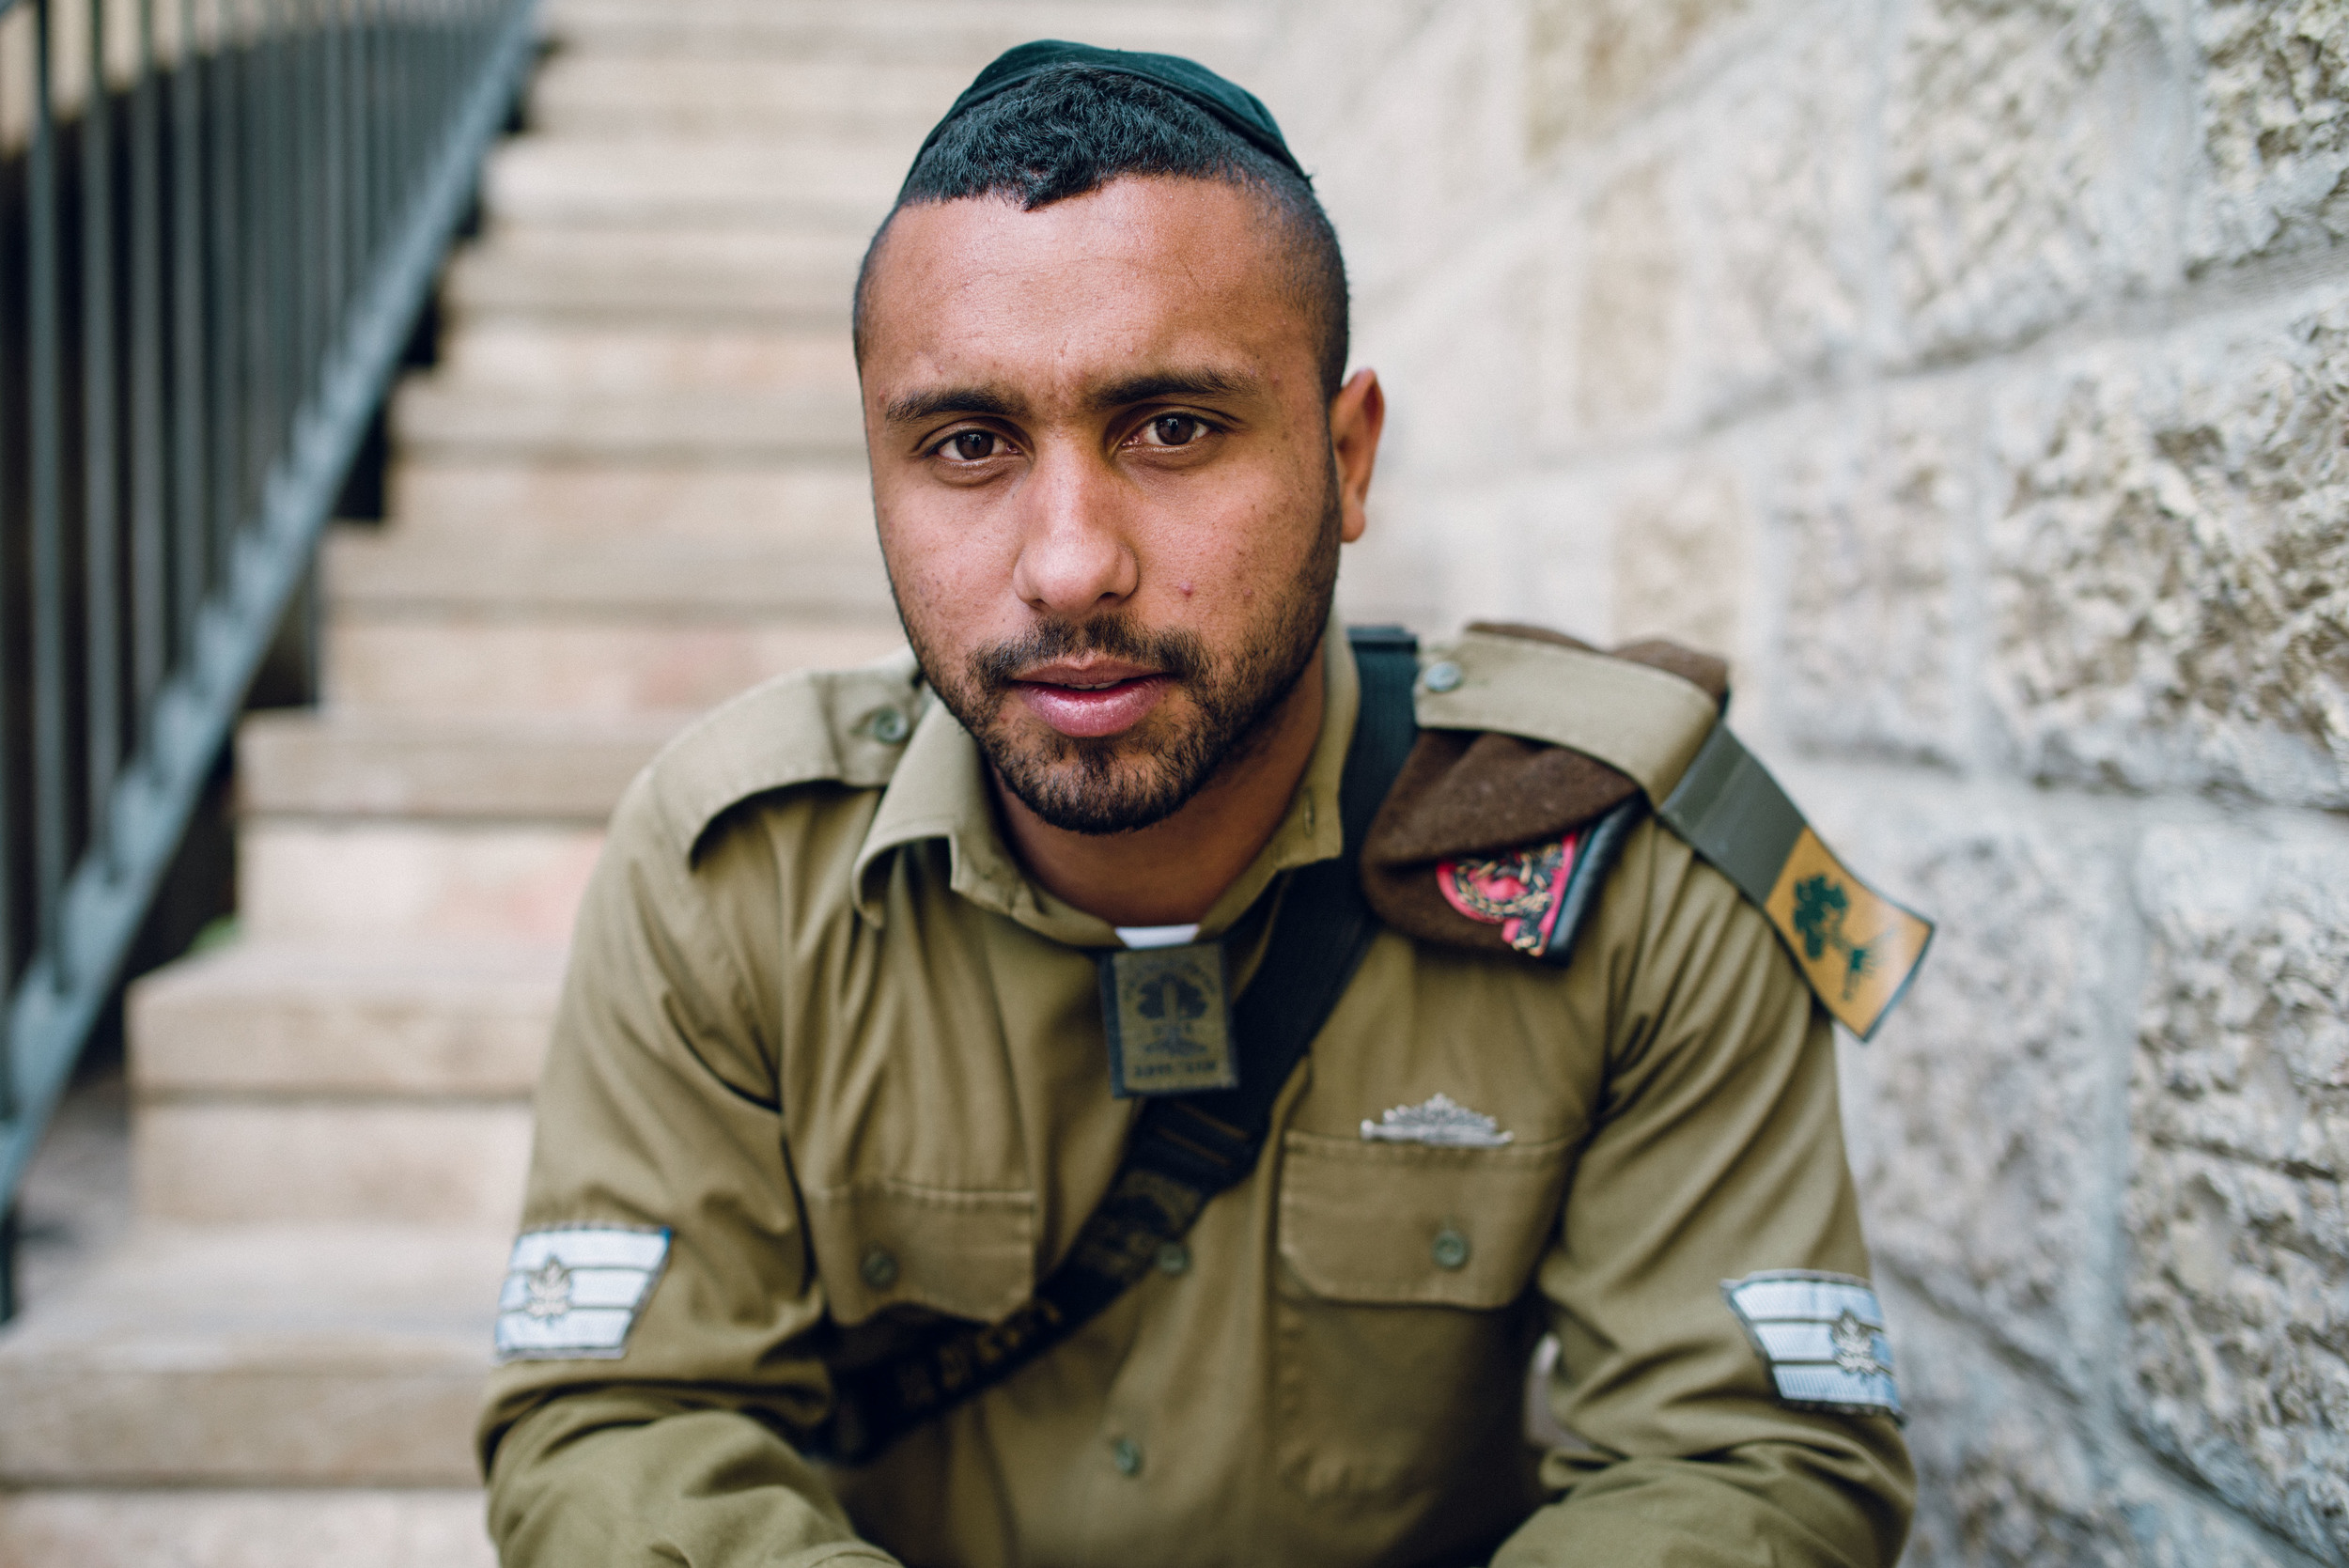 IDF soldier in Jerusalem, Israel